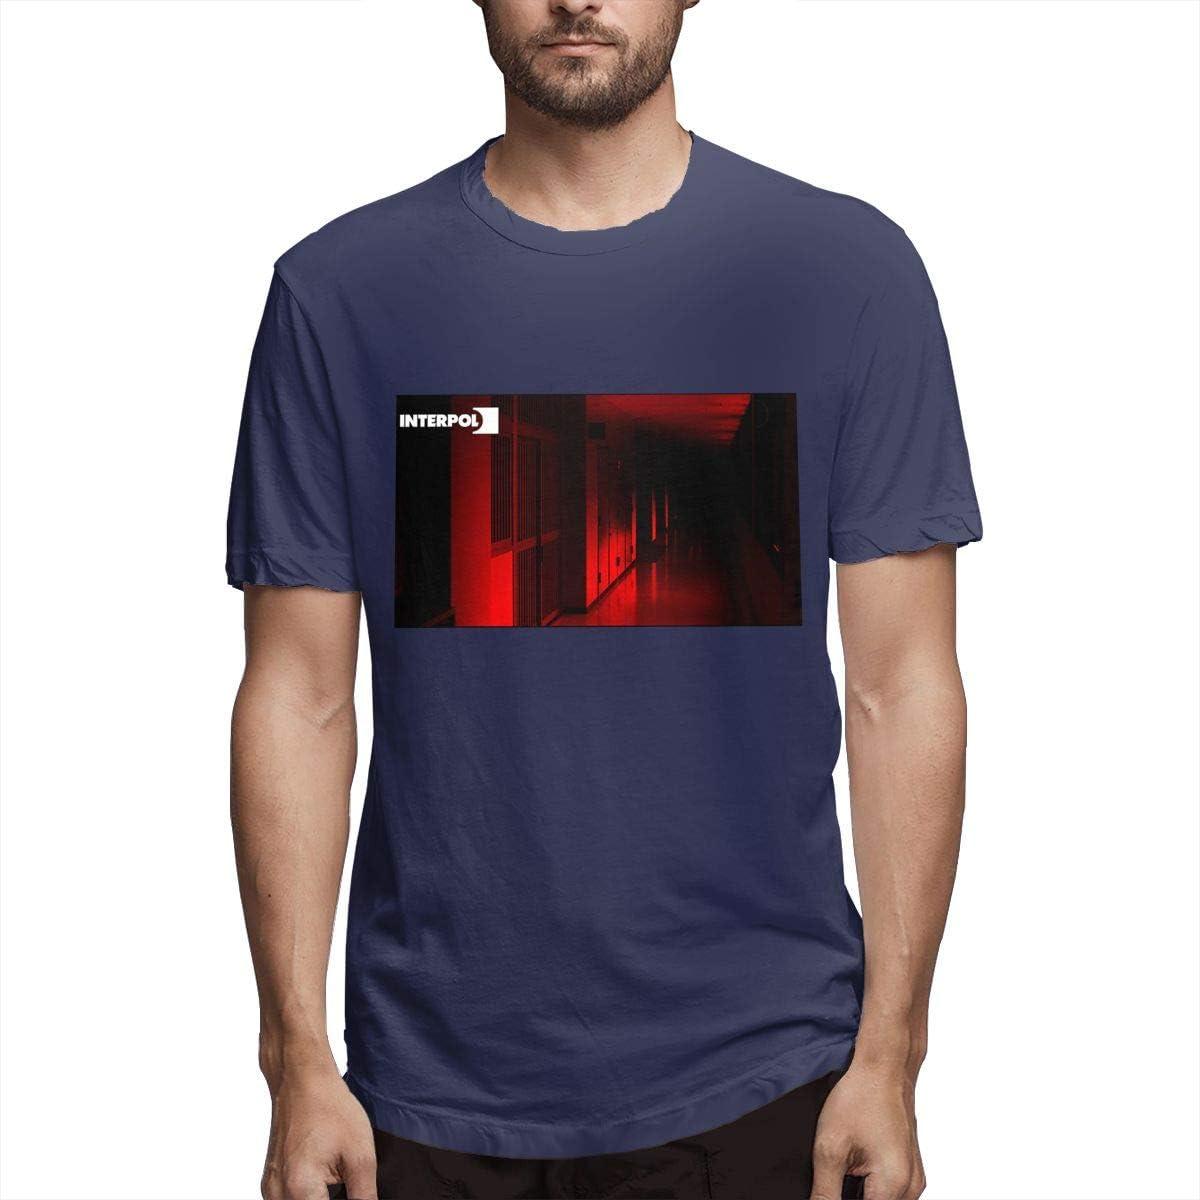 Patriciaanewbury Boy's Interpol Band Funny T-shirts Short Sleeves Navy